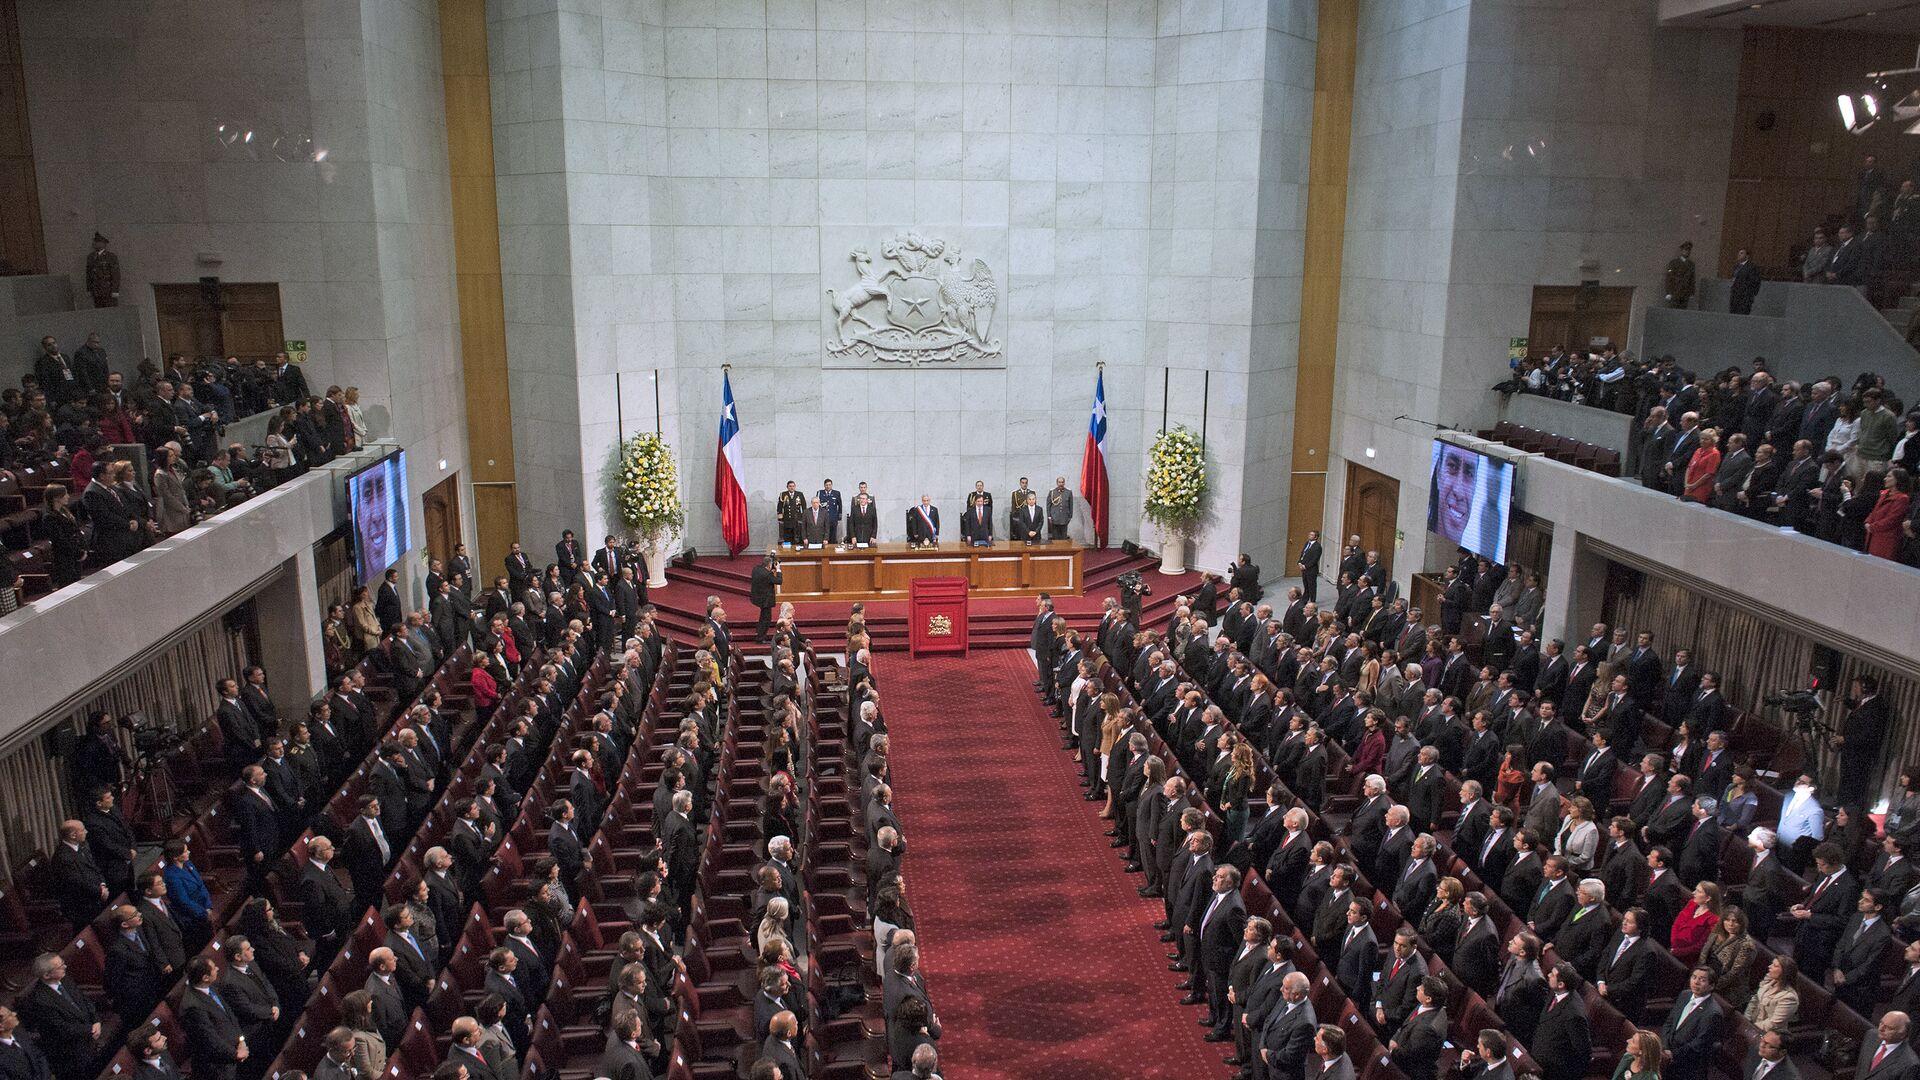 Congreso de Chile (archivo) - Sputnik Mundo, 1920, 23.04.2021